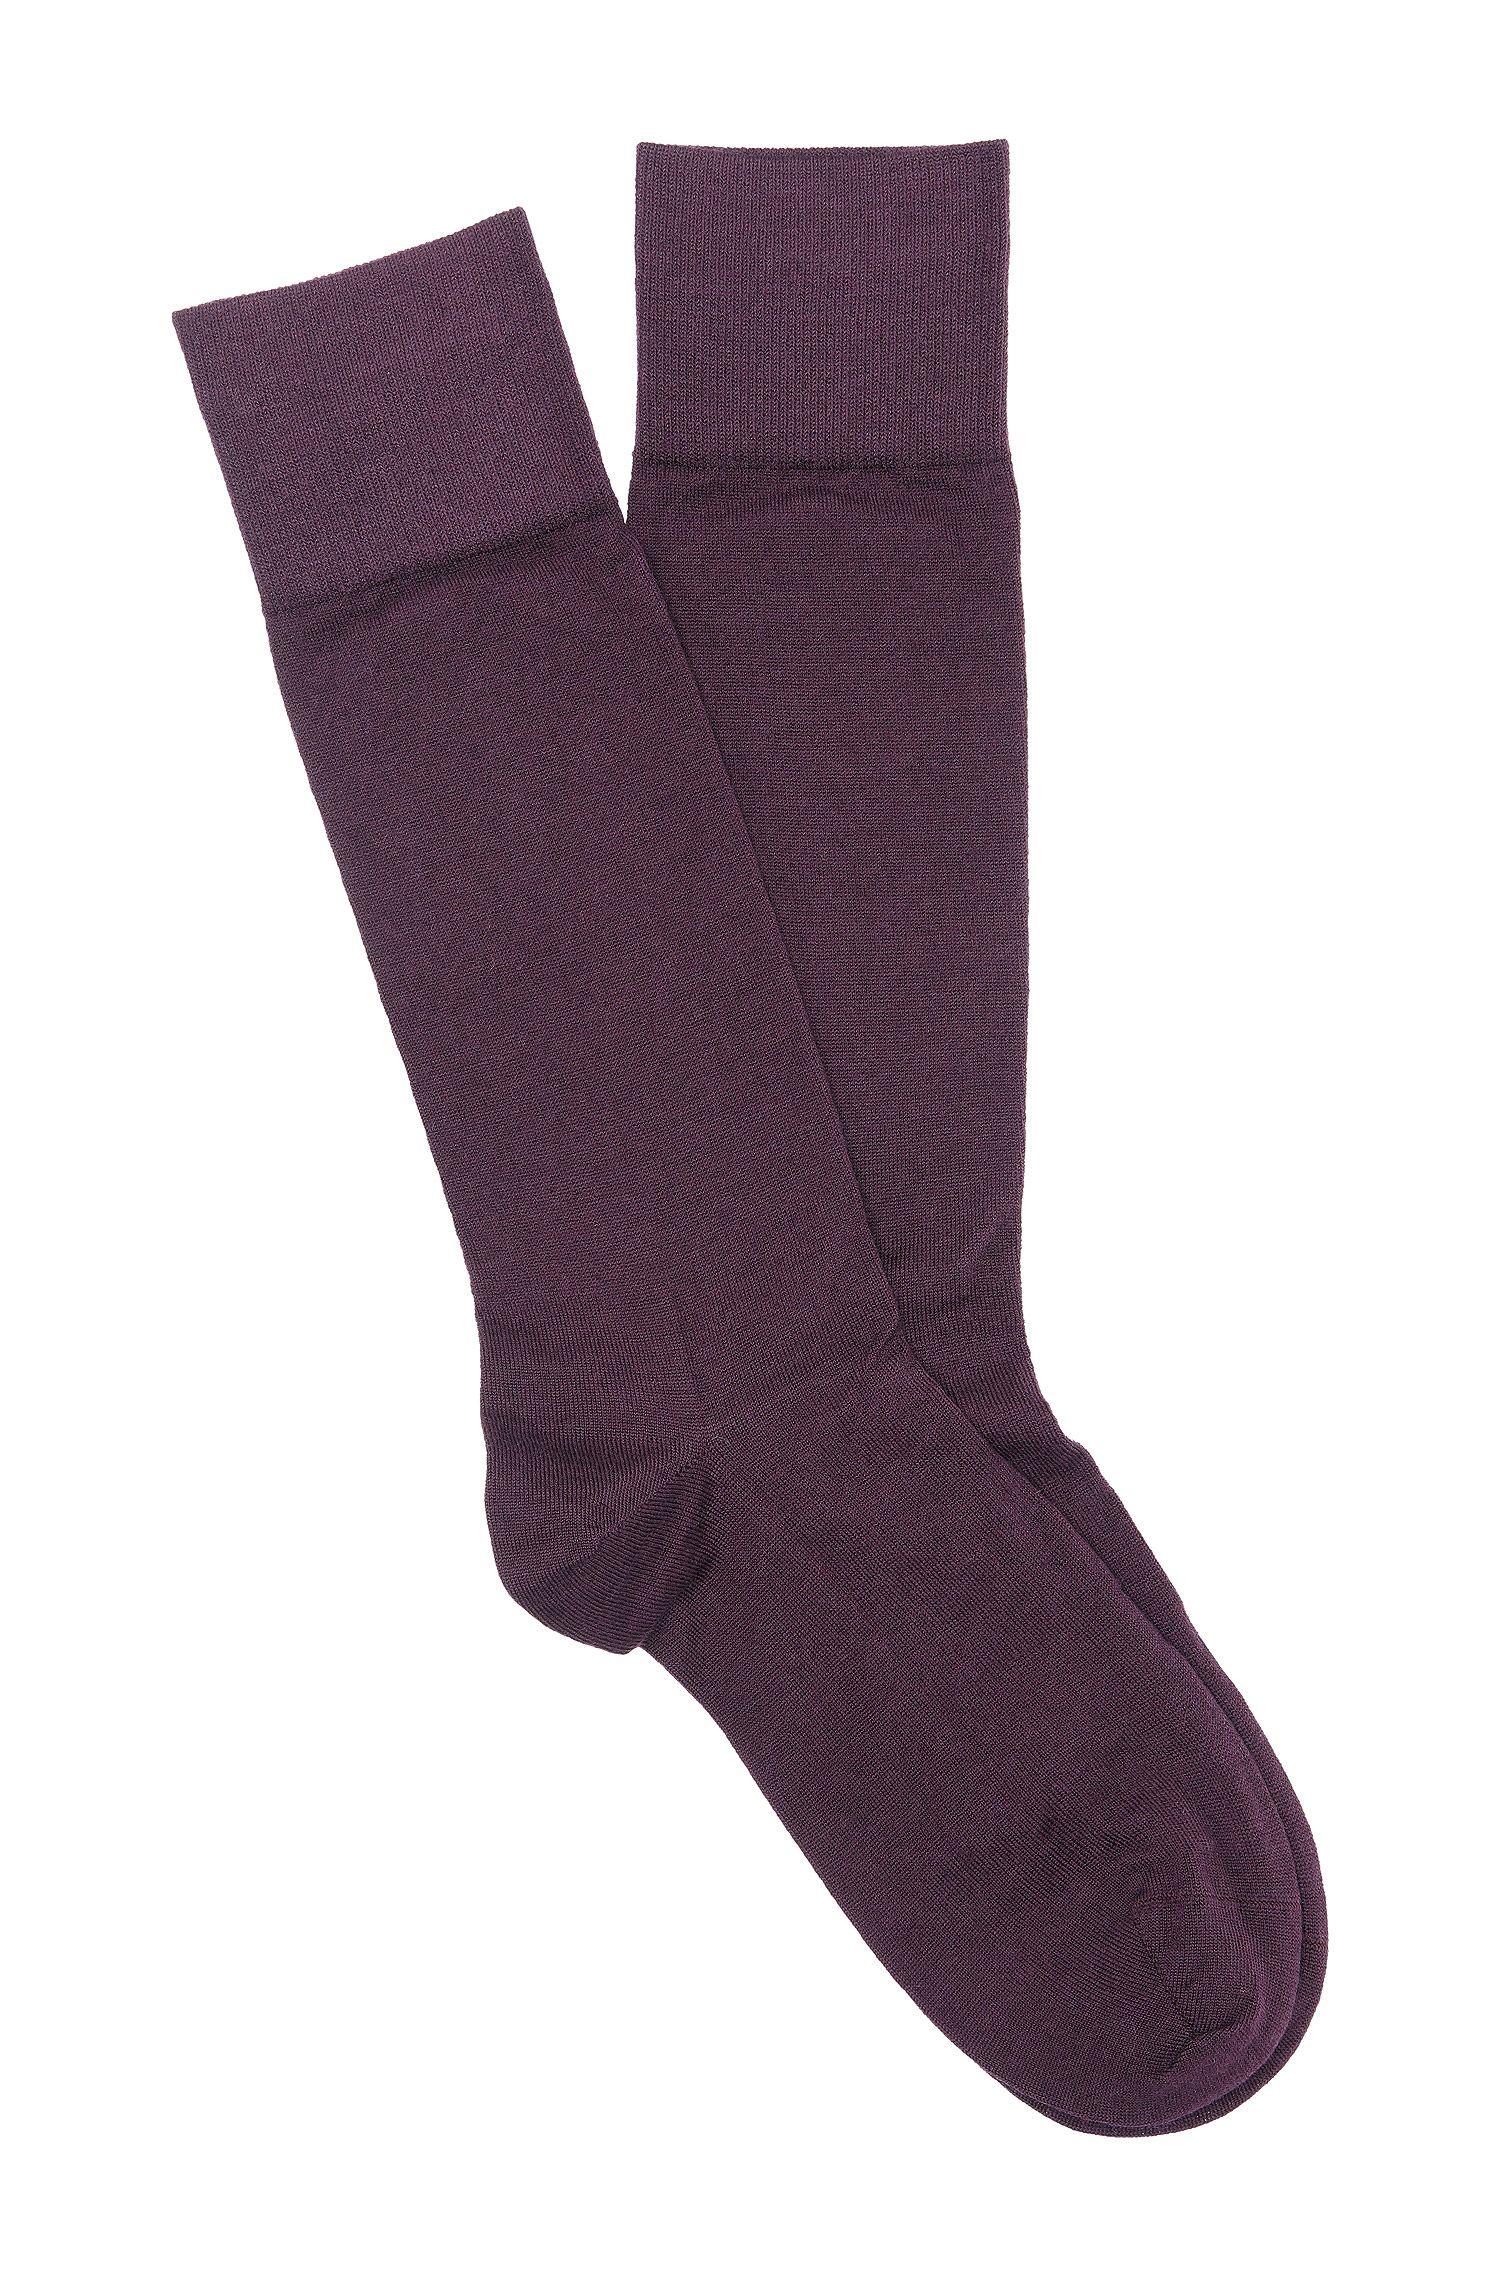 Socks 'TL Cashmere RS' in cashmere blend